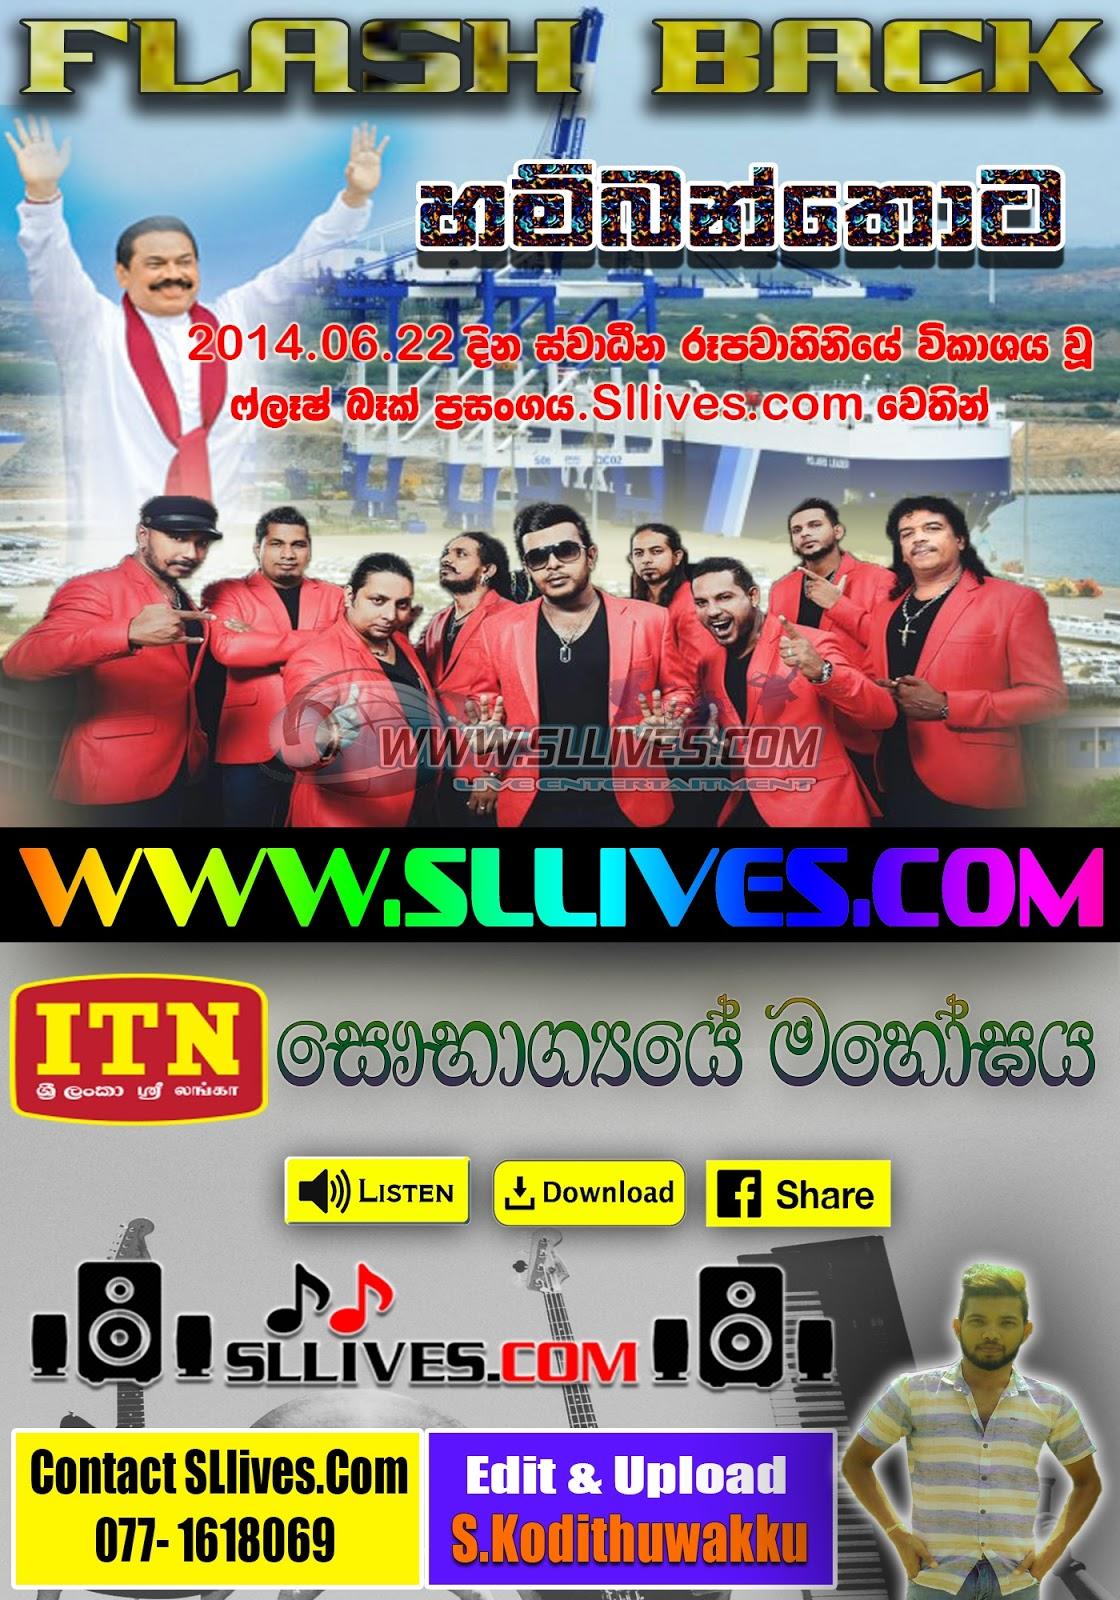 FLASH BACK LIVE IN HAMBANTHOTA 2014-06-22 - Www Sllives Com